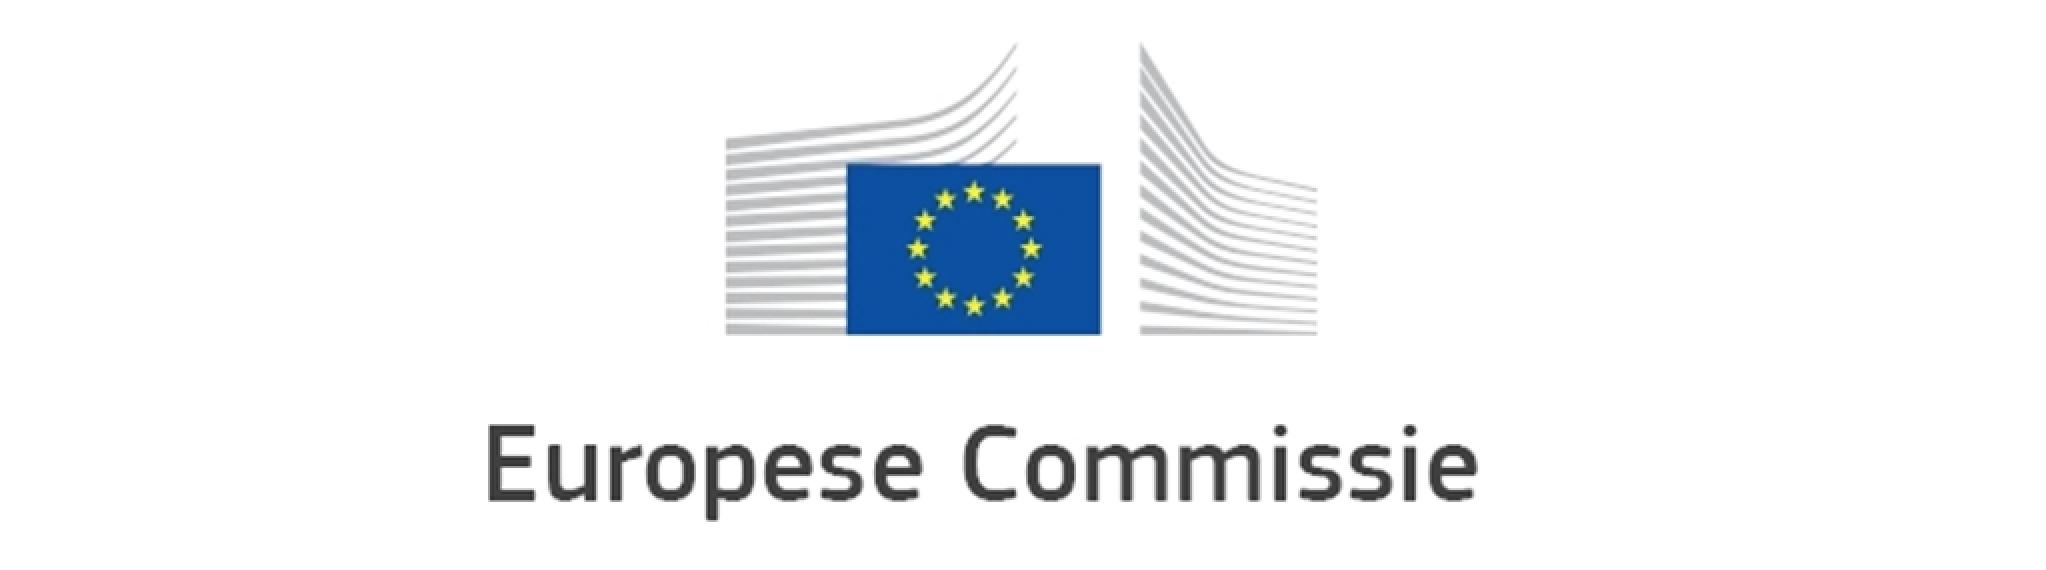 Europese commissie (3)